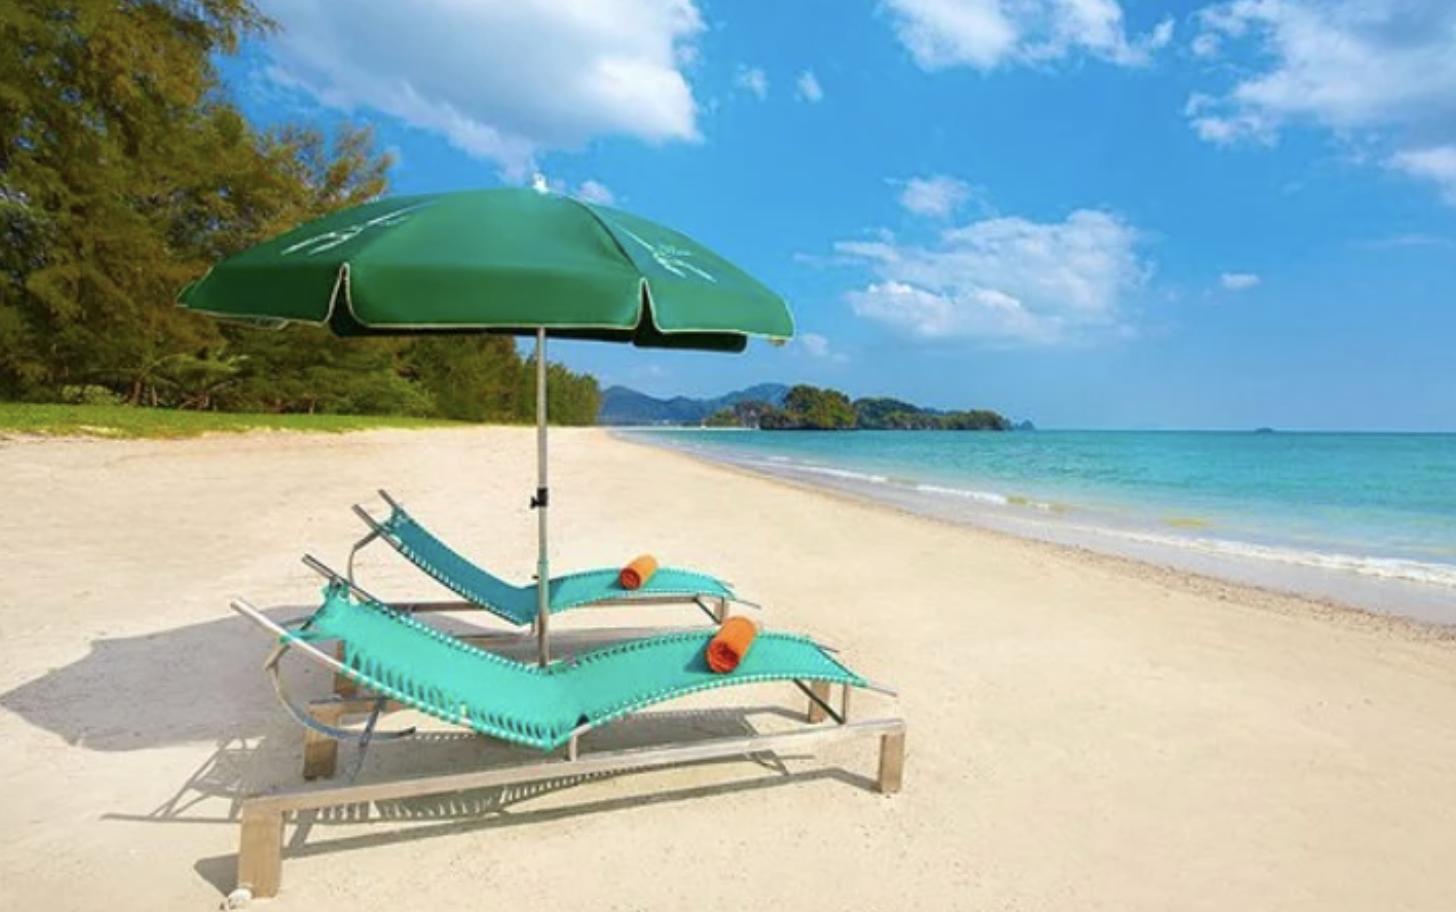 KRABI, THAILAND – Cha-Da Resort